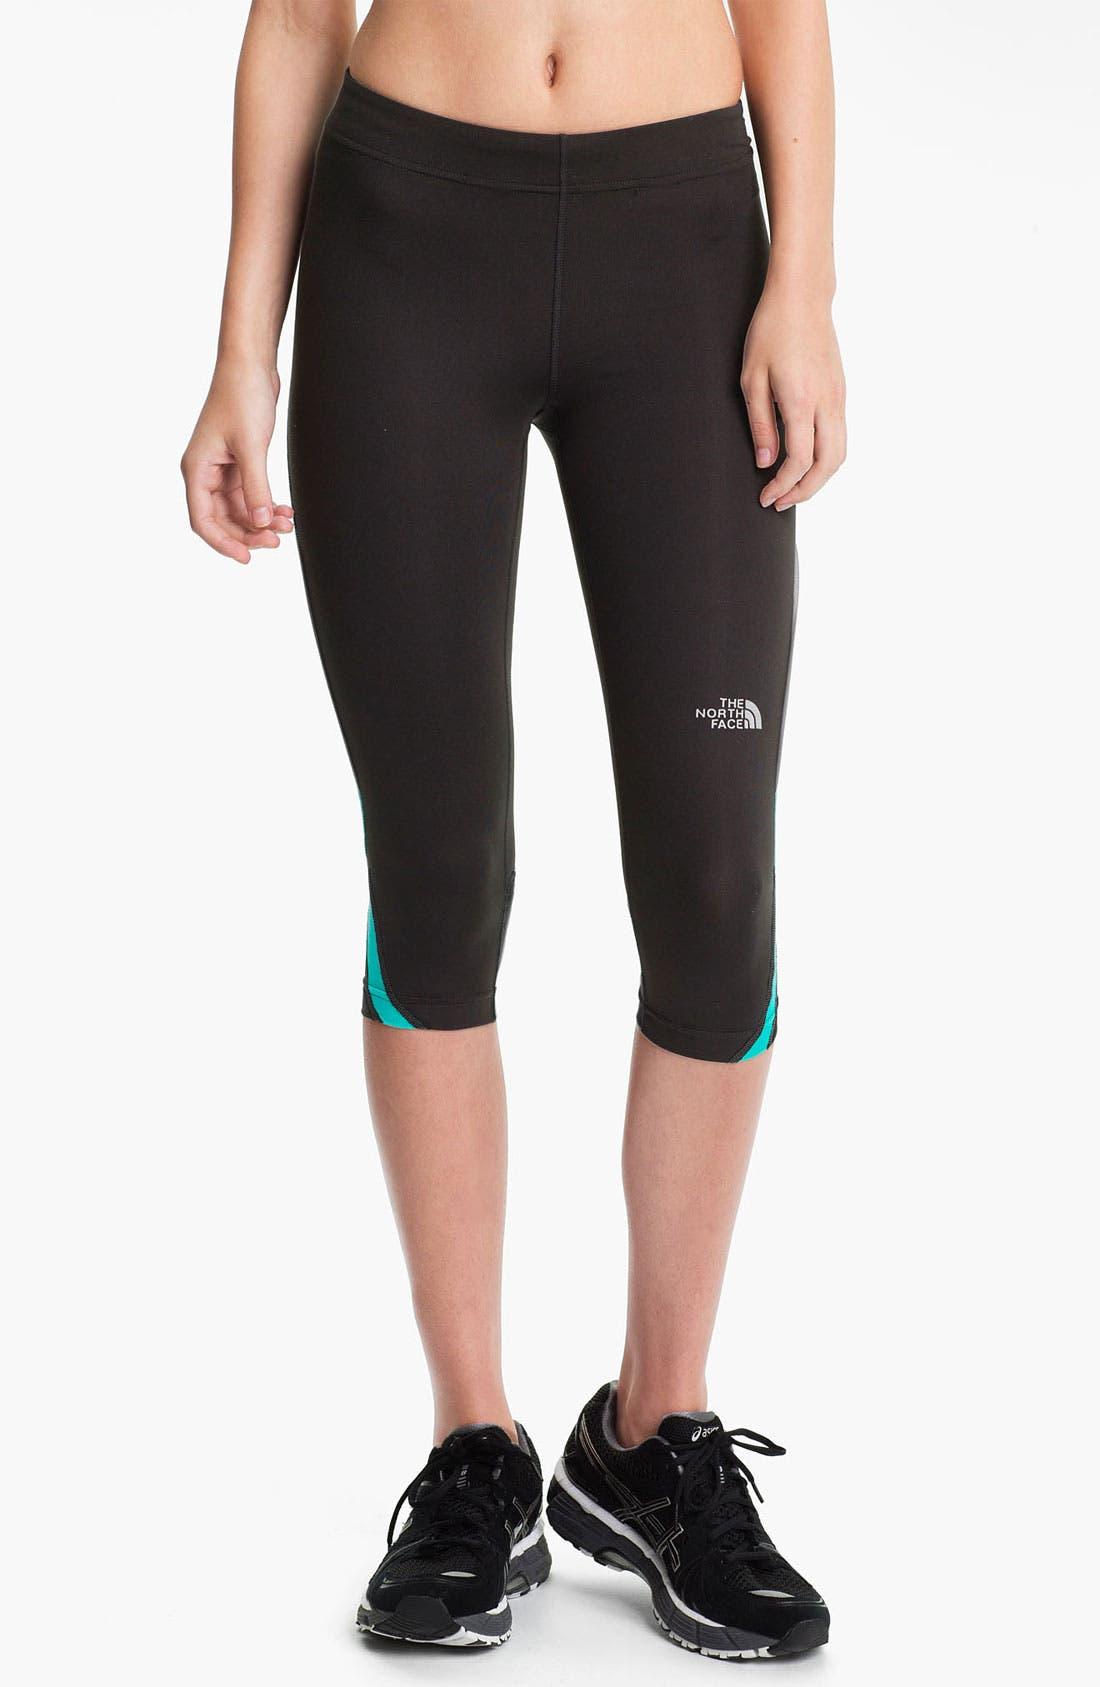 Main Image - The North Face 'GTD' Capri Pants